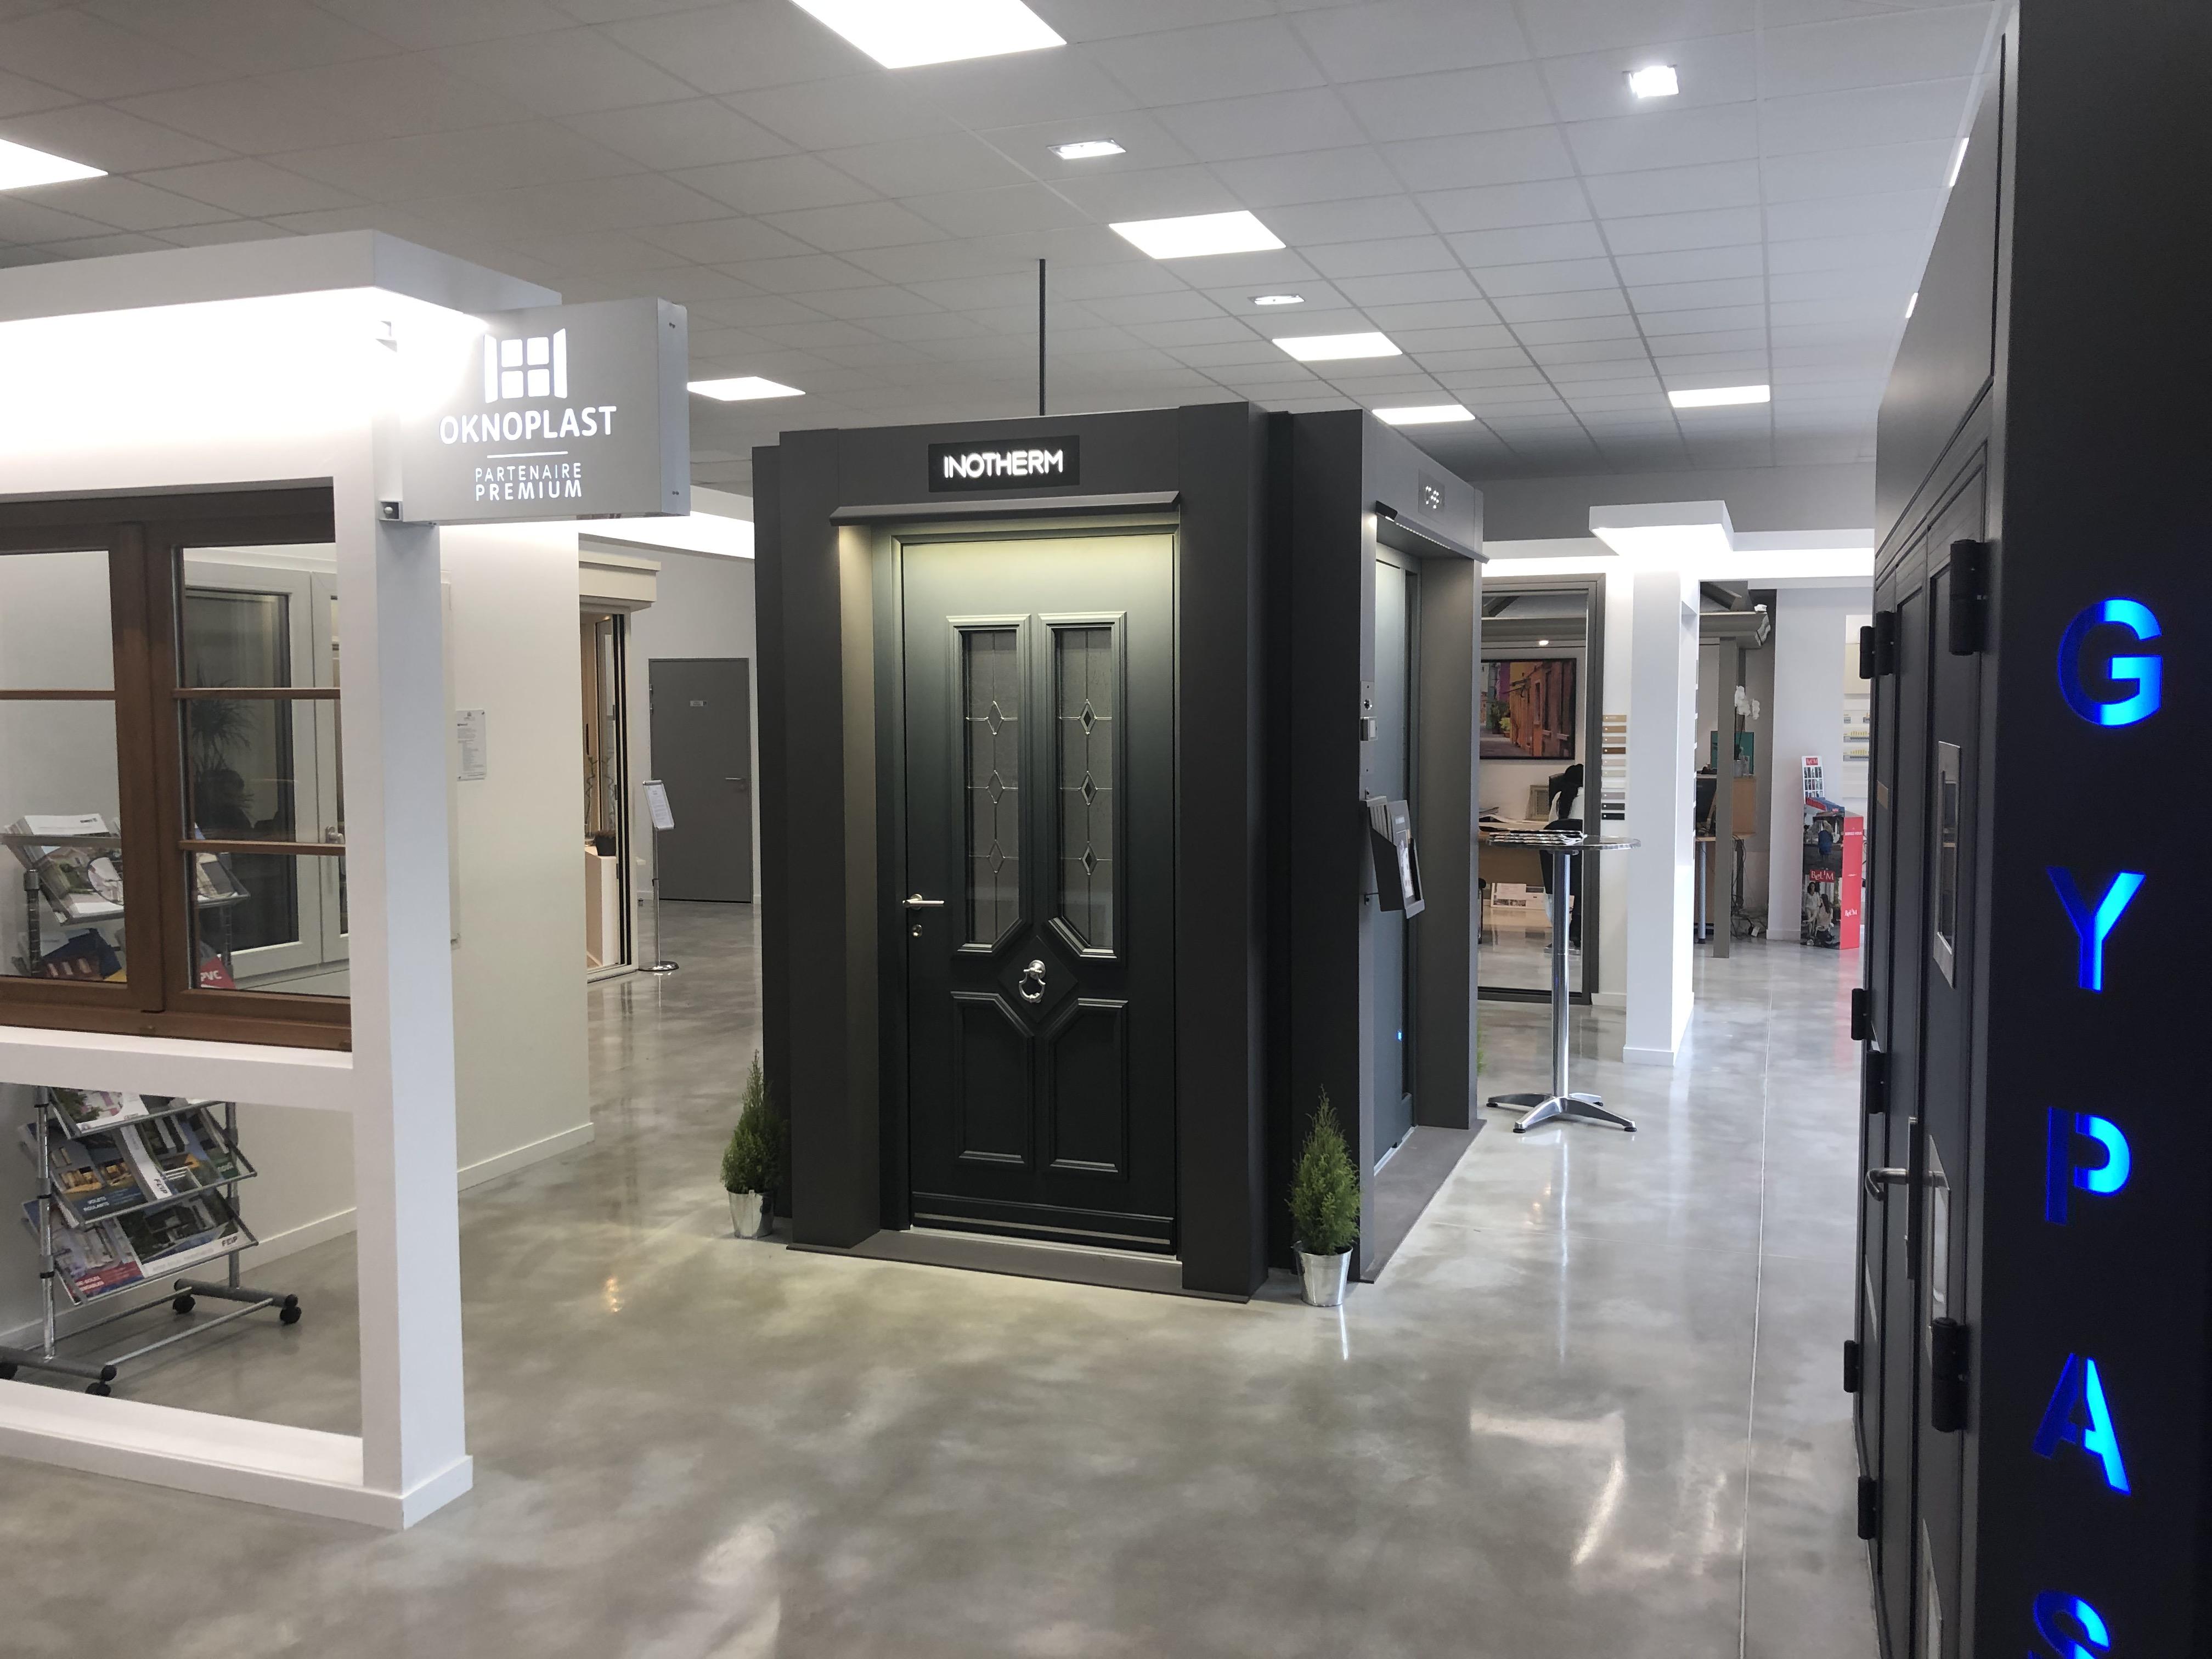 portes-verre-clair-nouveau-showroom-l-isle-adam